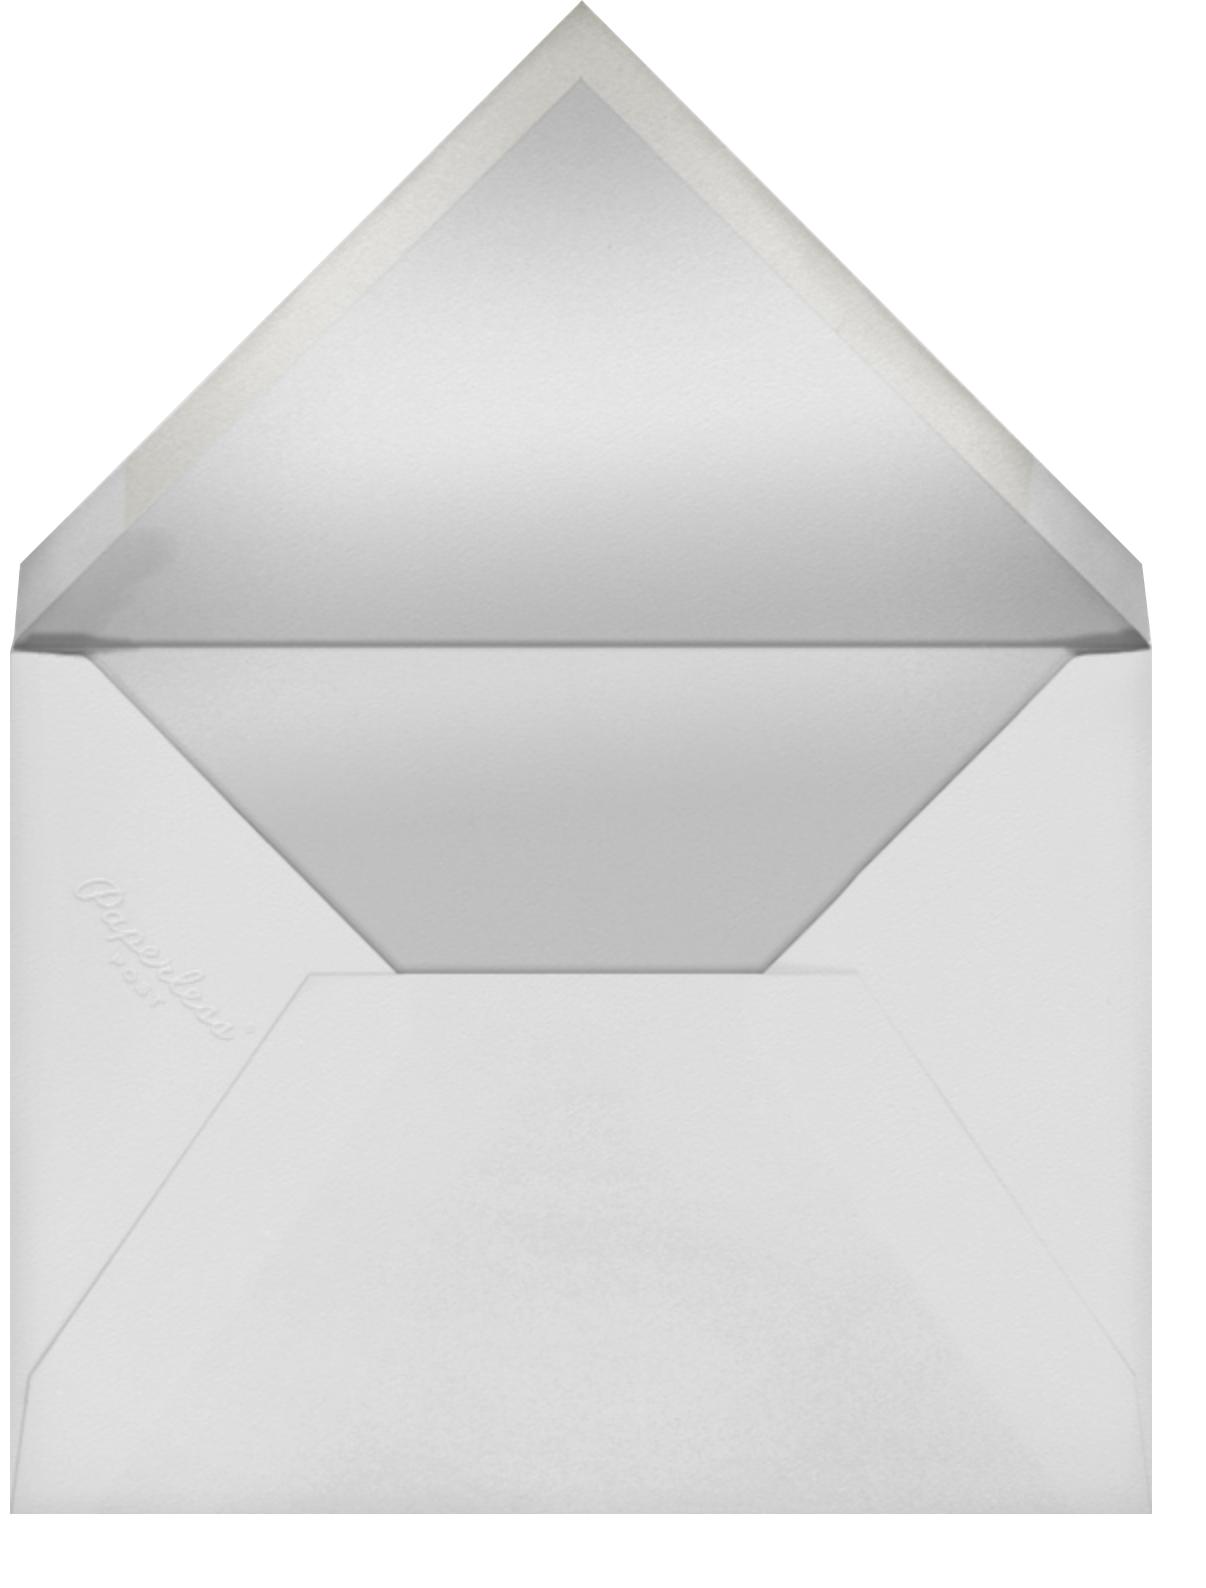 Toronto Skyline View (Menu) - Black/White - Paperless Post - Menus - envelope back